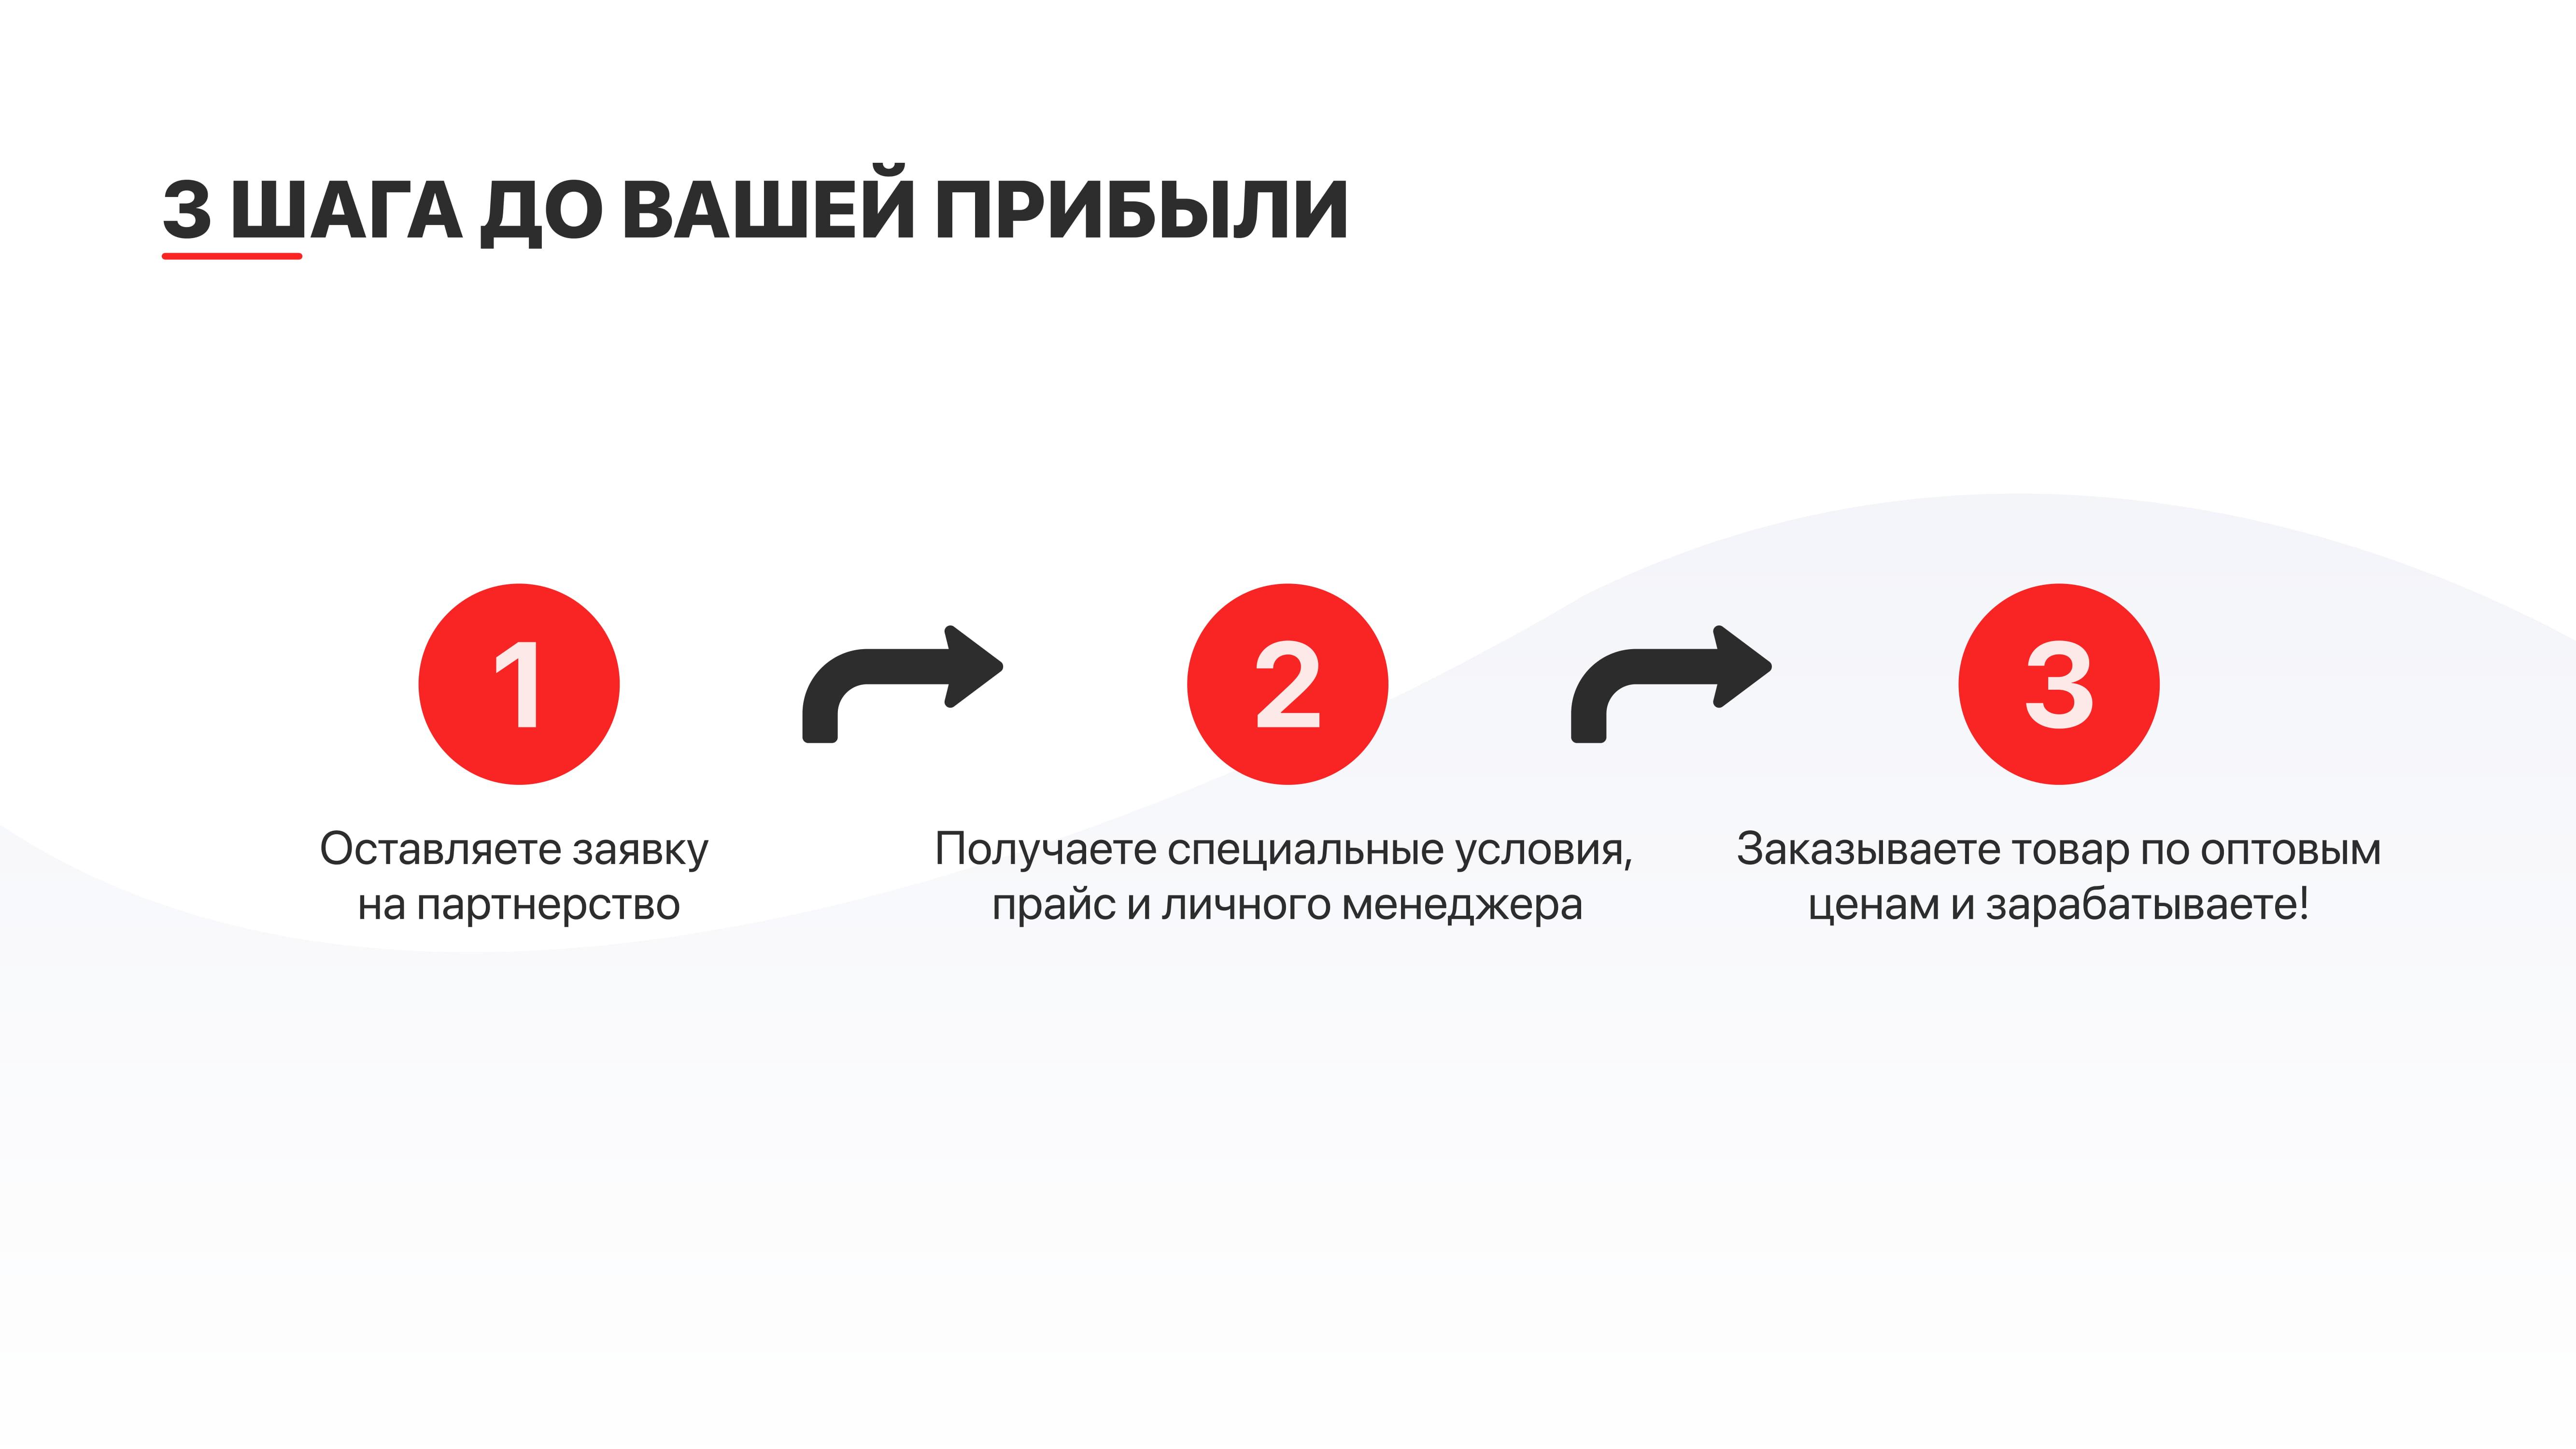 https://audiostart.ru/images/upload/Audio%20Start%20Presentation%20Print-09.jpg